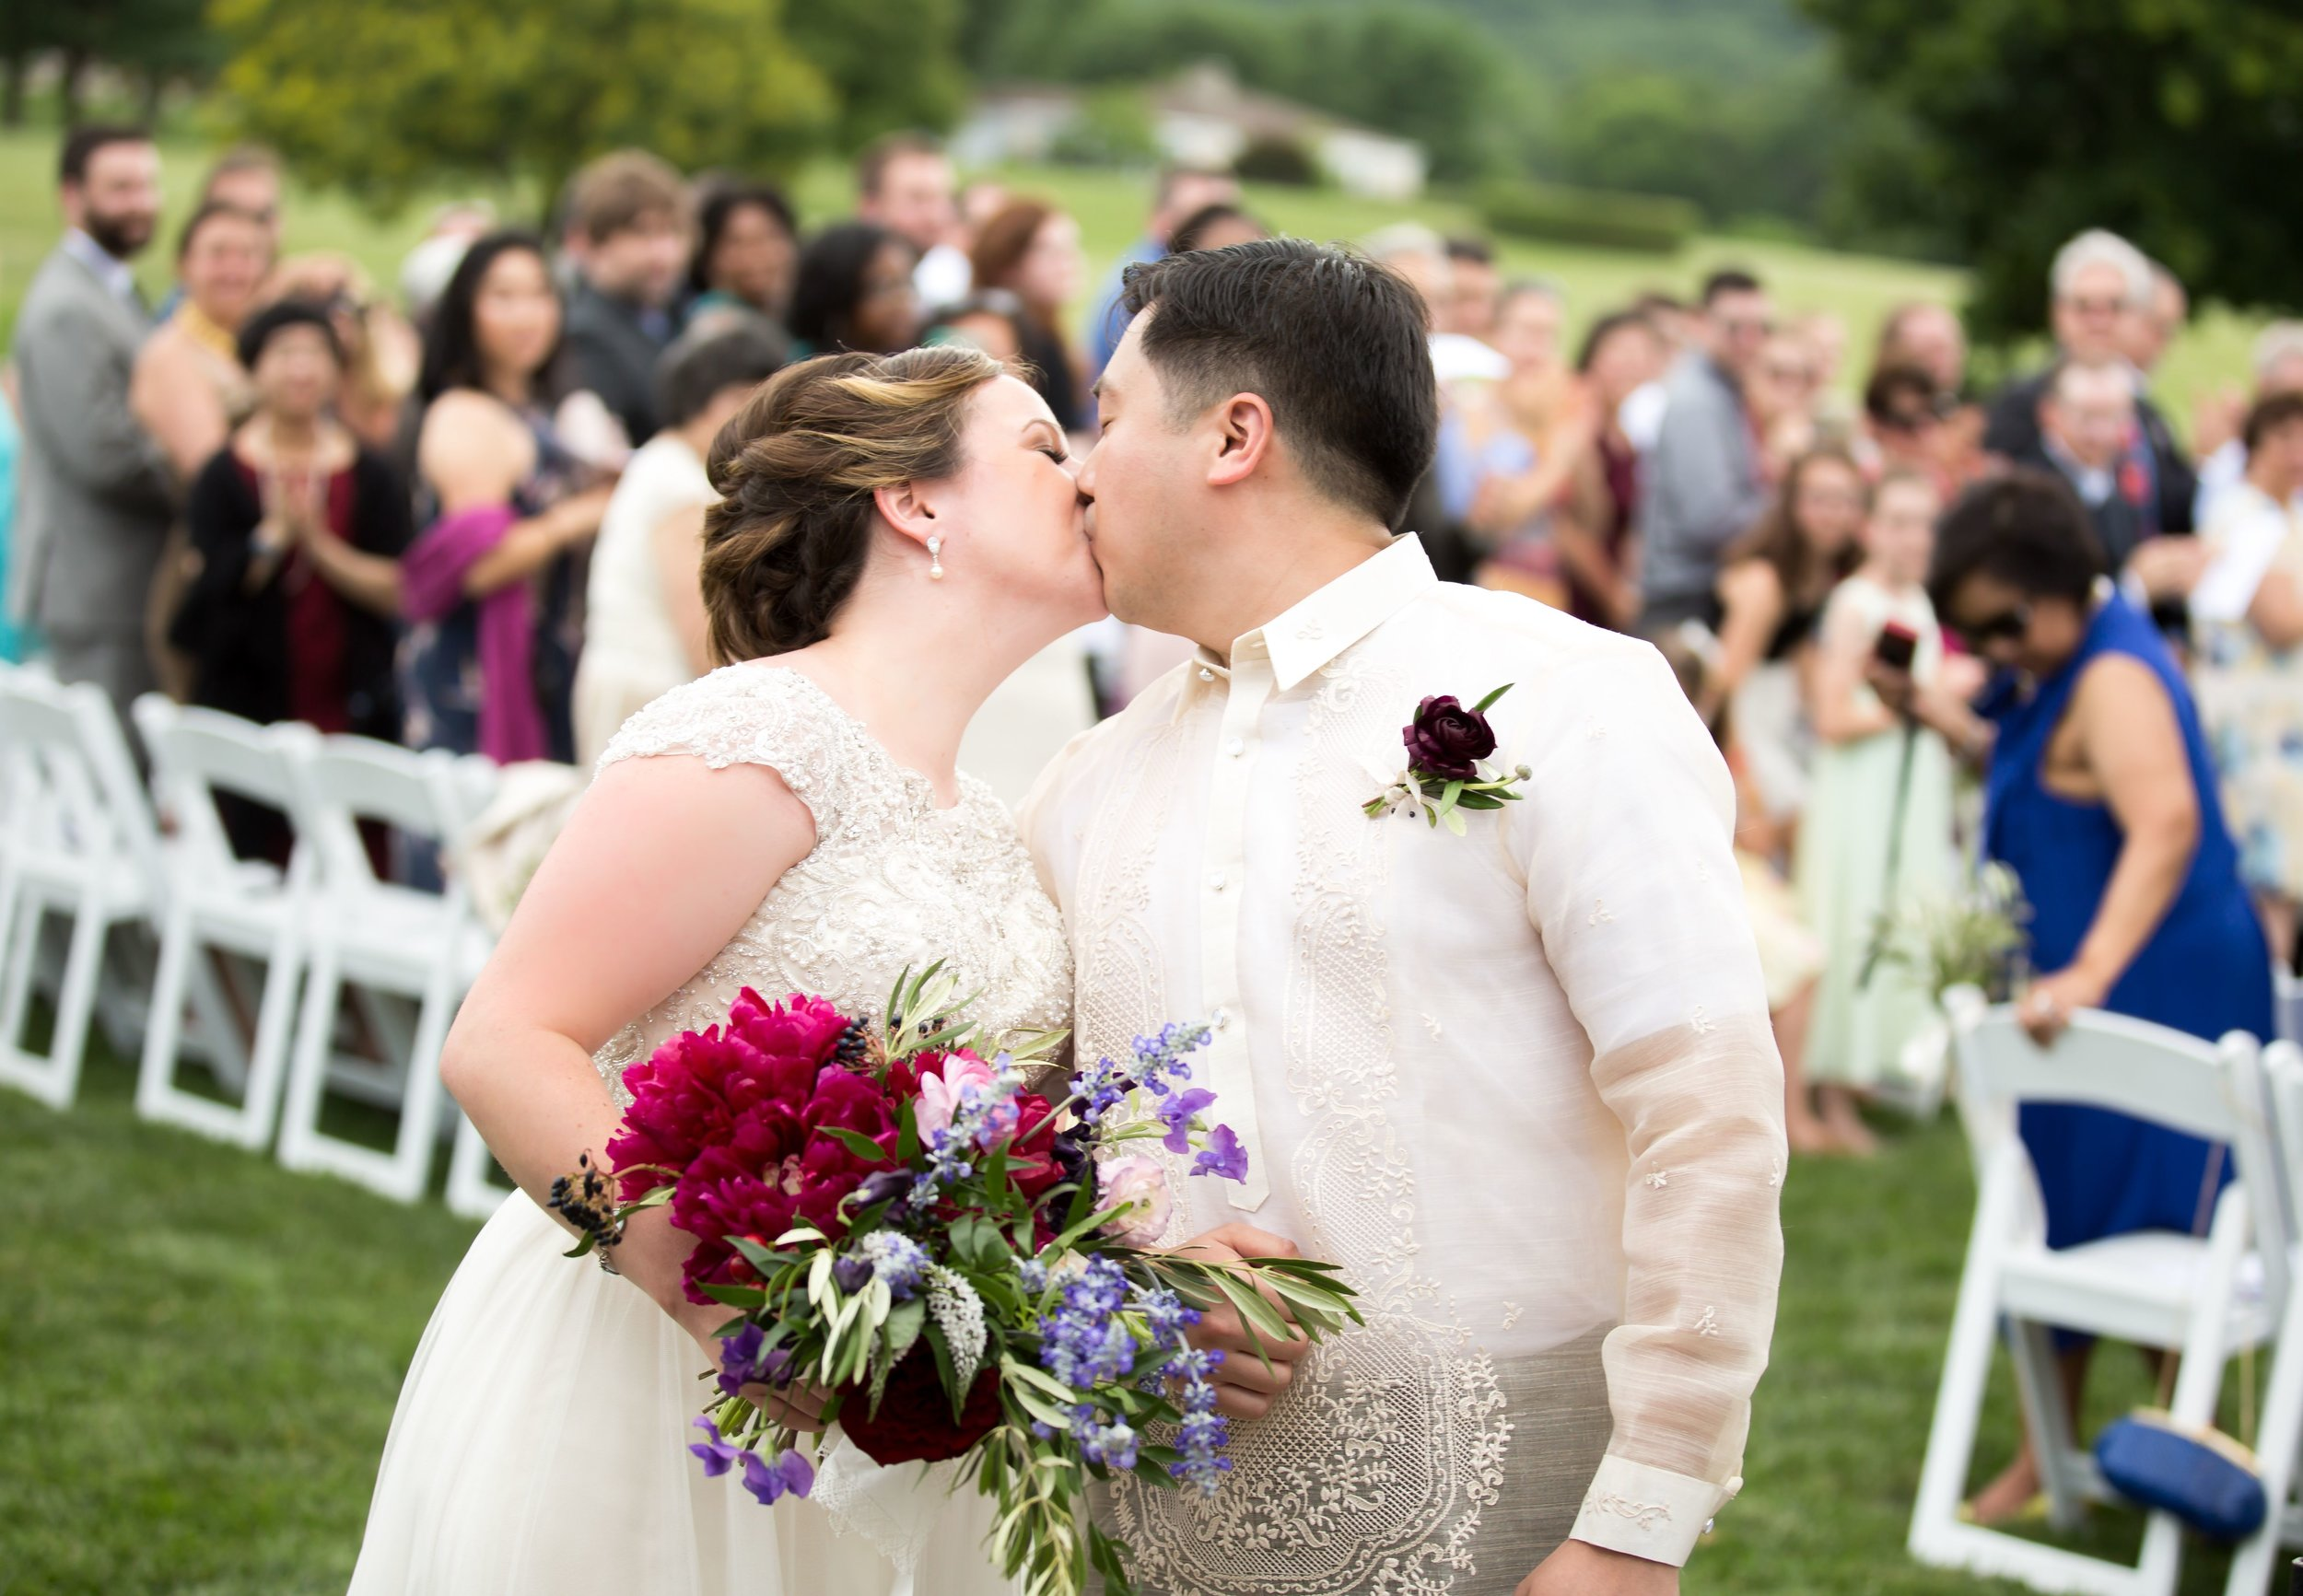 Margaret + Ben on June 23, 2017 ♥ Kimberly Dean Photos at Evergreen Country Club (Haymarket, VA)